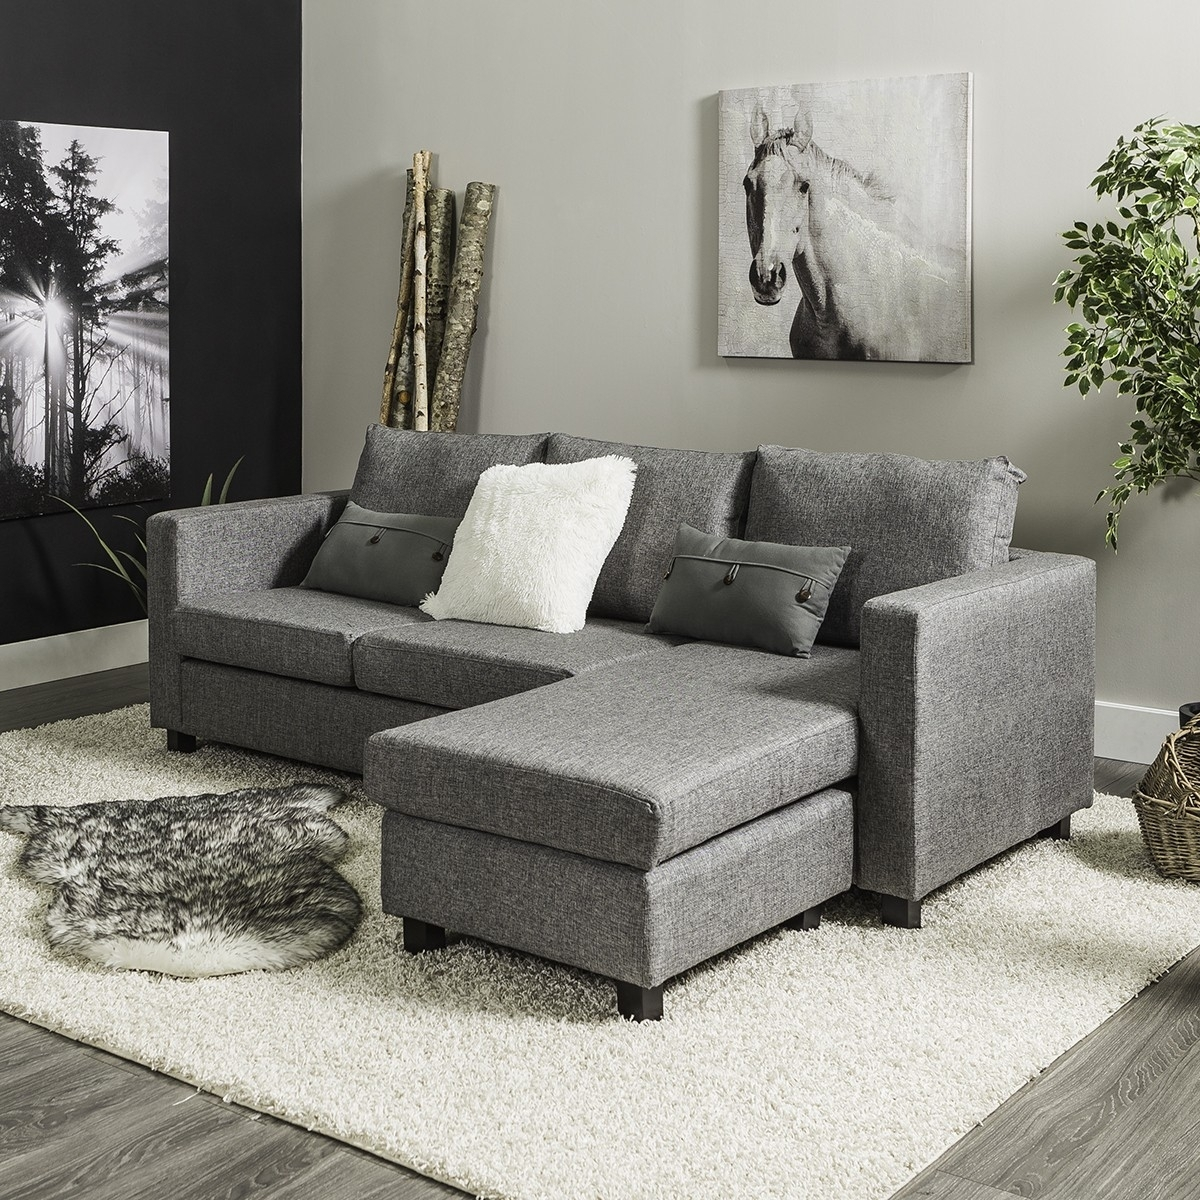 Casa Corner Sofa (Grey) For Jysk Sectional Sofas (Image 4 of 10)